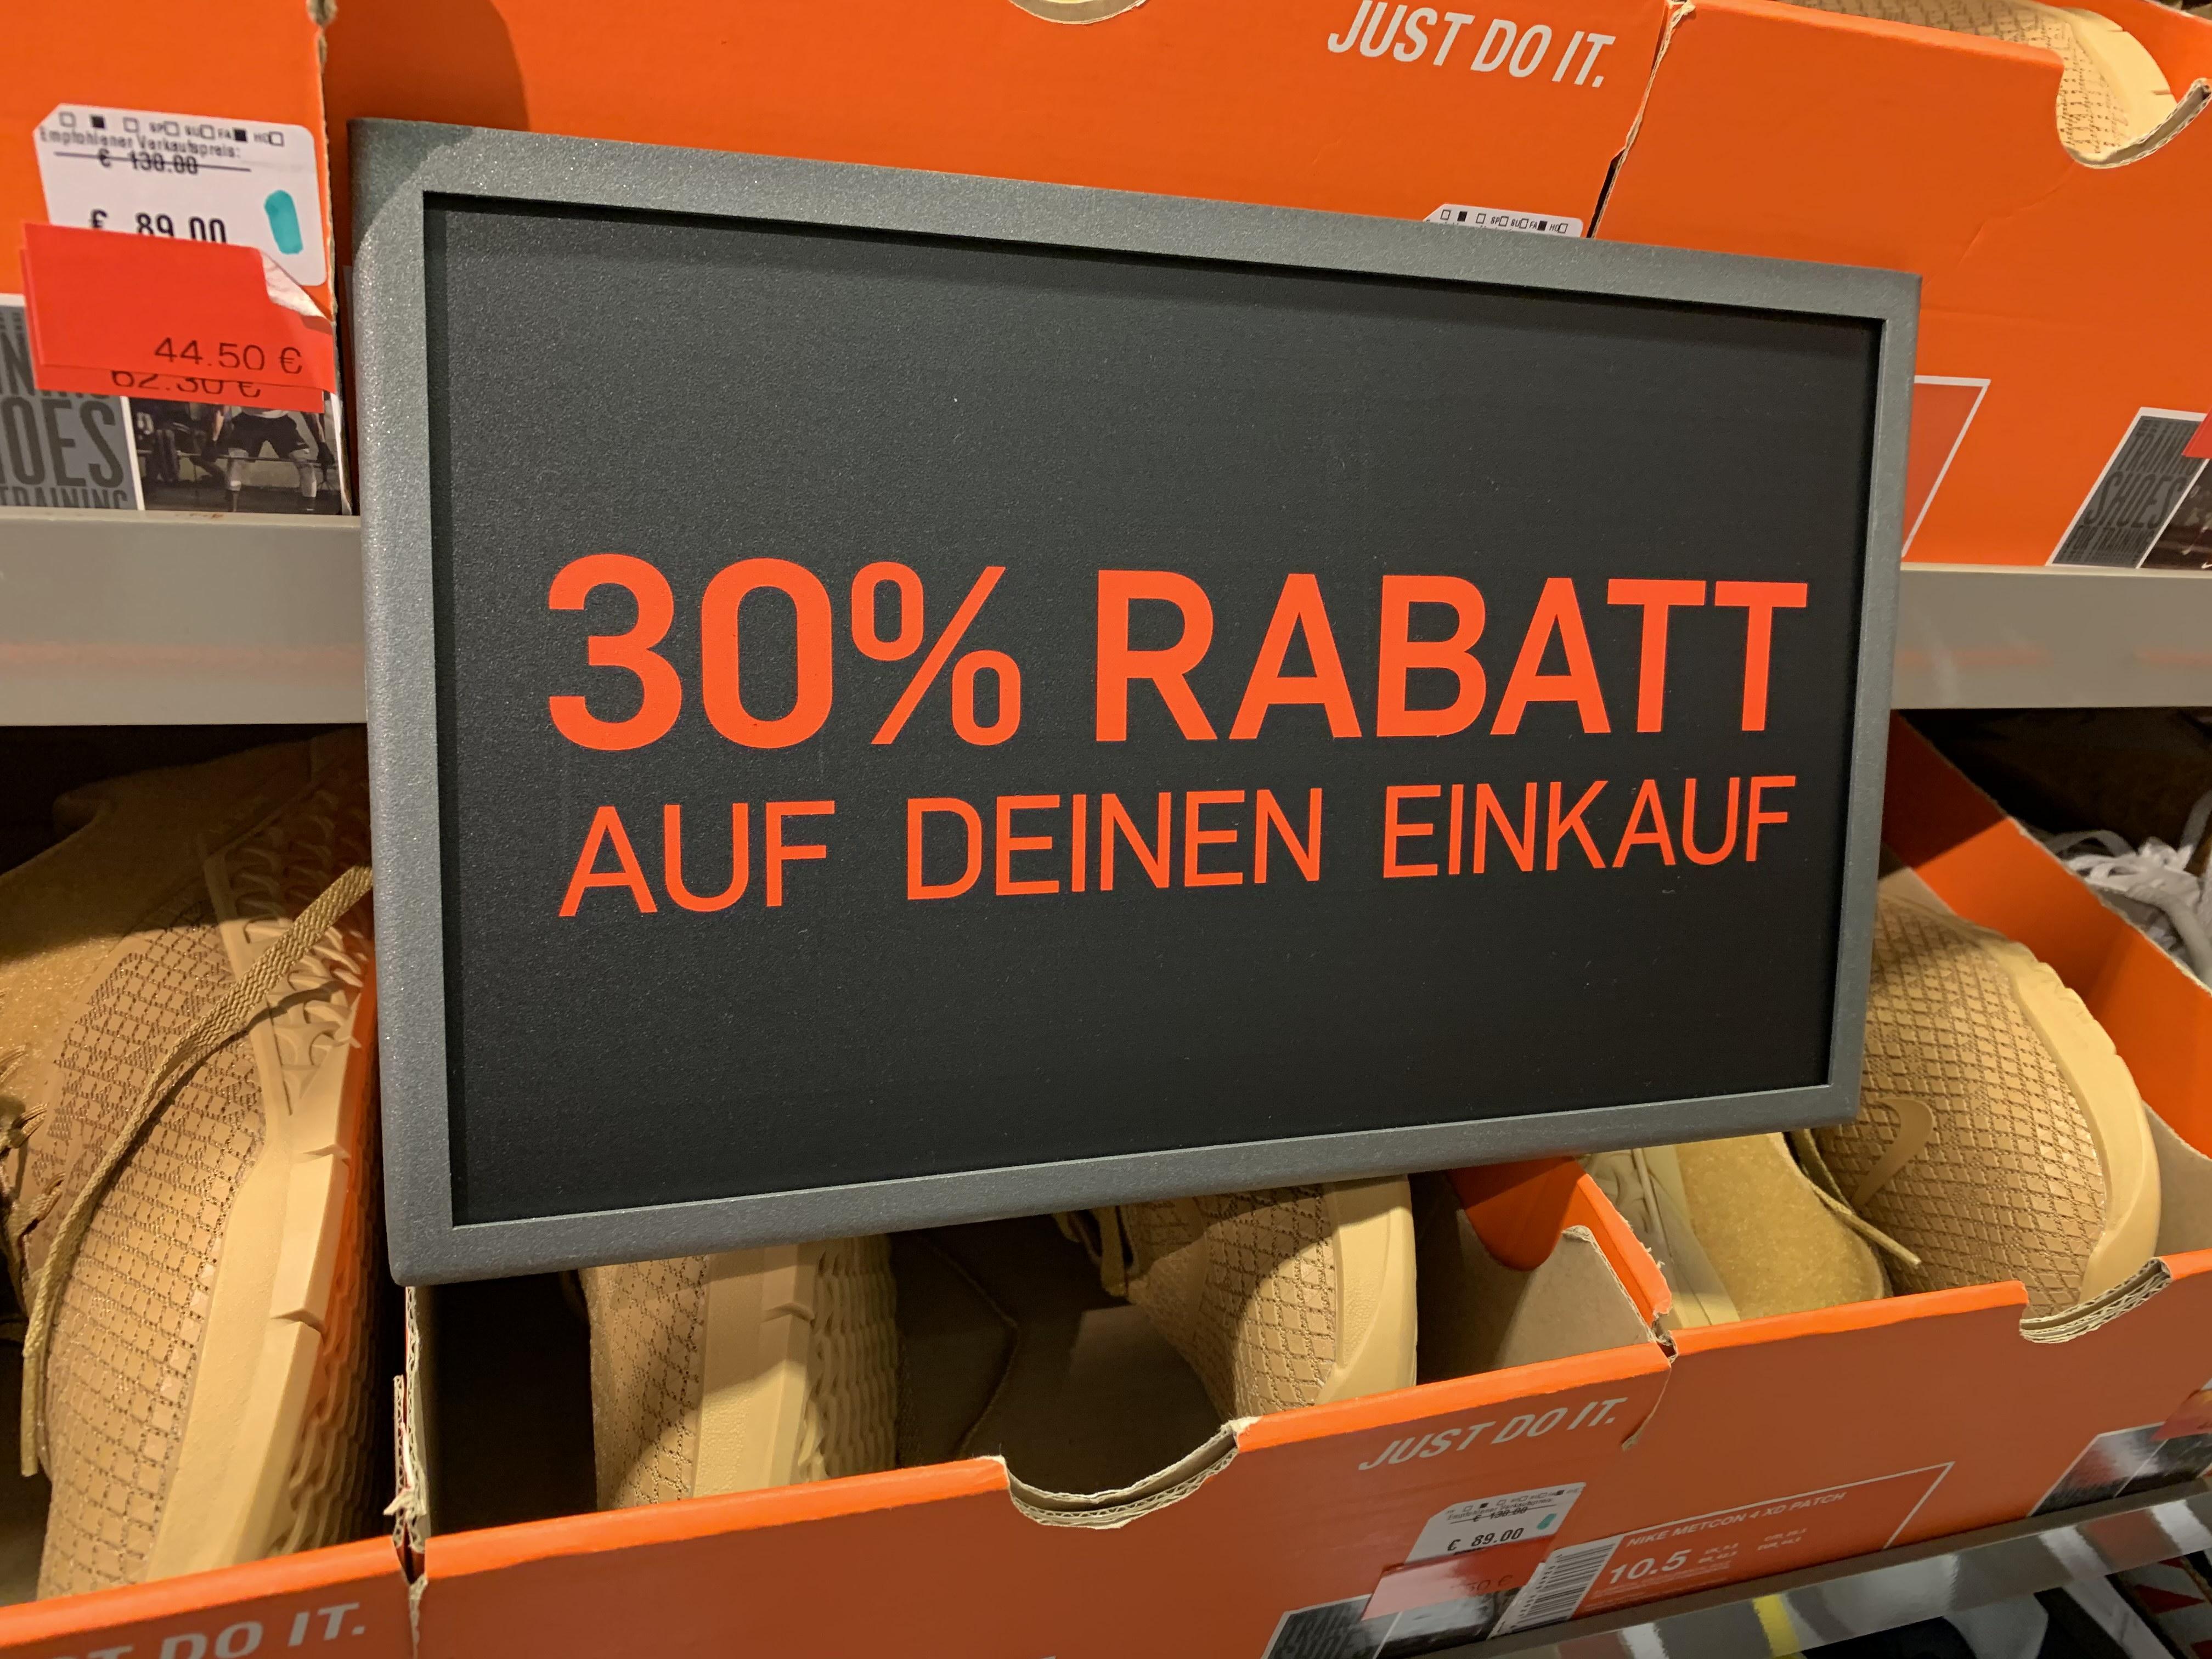 Nike Ochtrup McArthurGlen Outlet 30% auf Alles